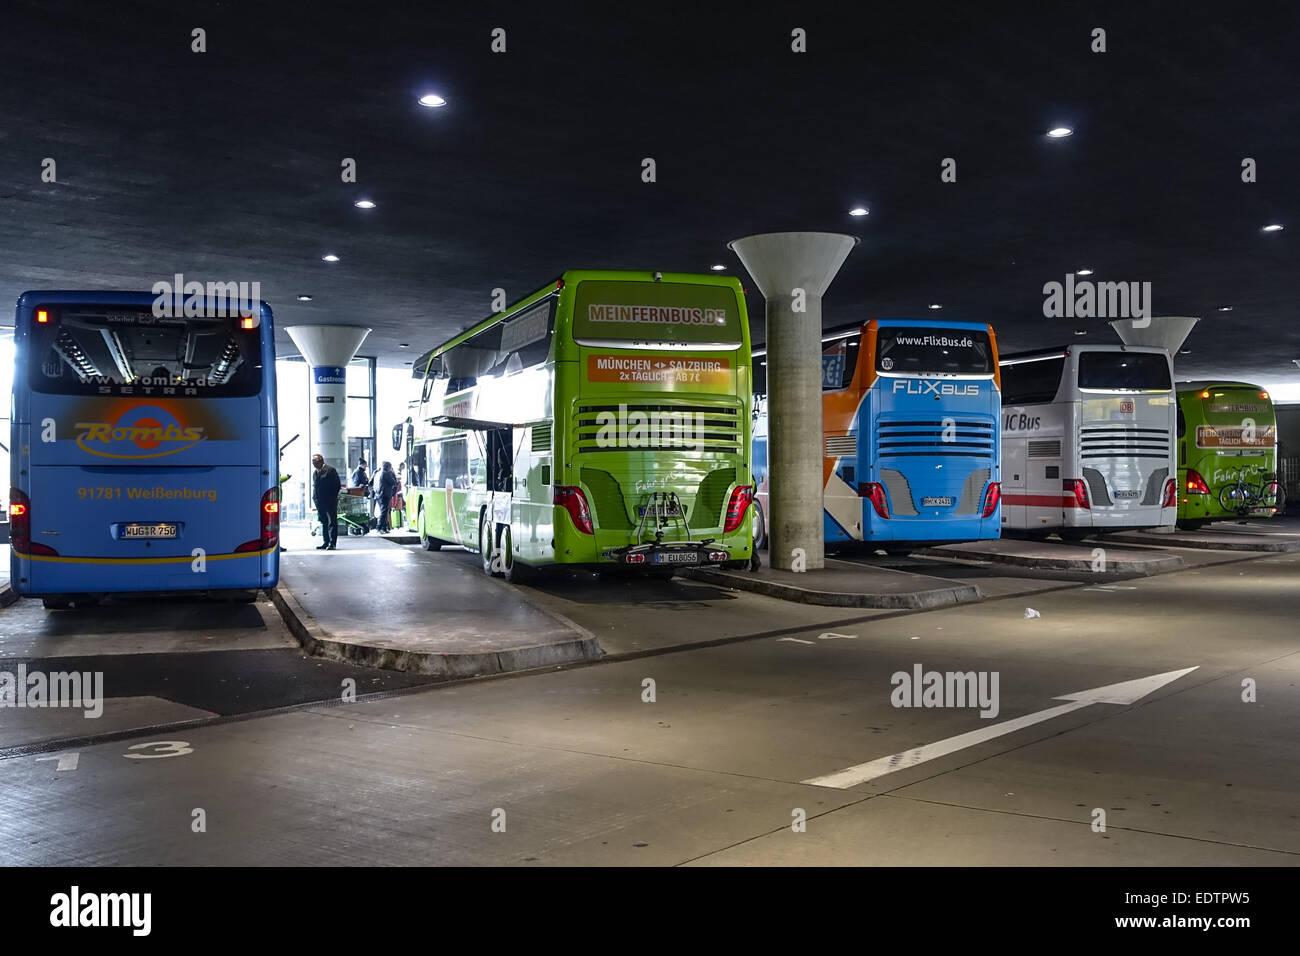 zentraler omnibusbahnhof zob m nchen oberbayern bayern stock photo 77376801 alamy. Black Bedroom Furniture Sets. Home Design Ideas